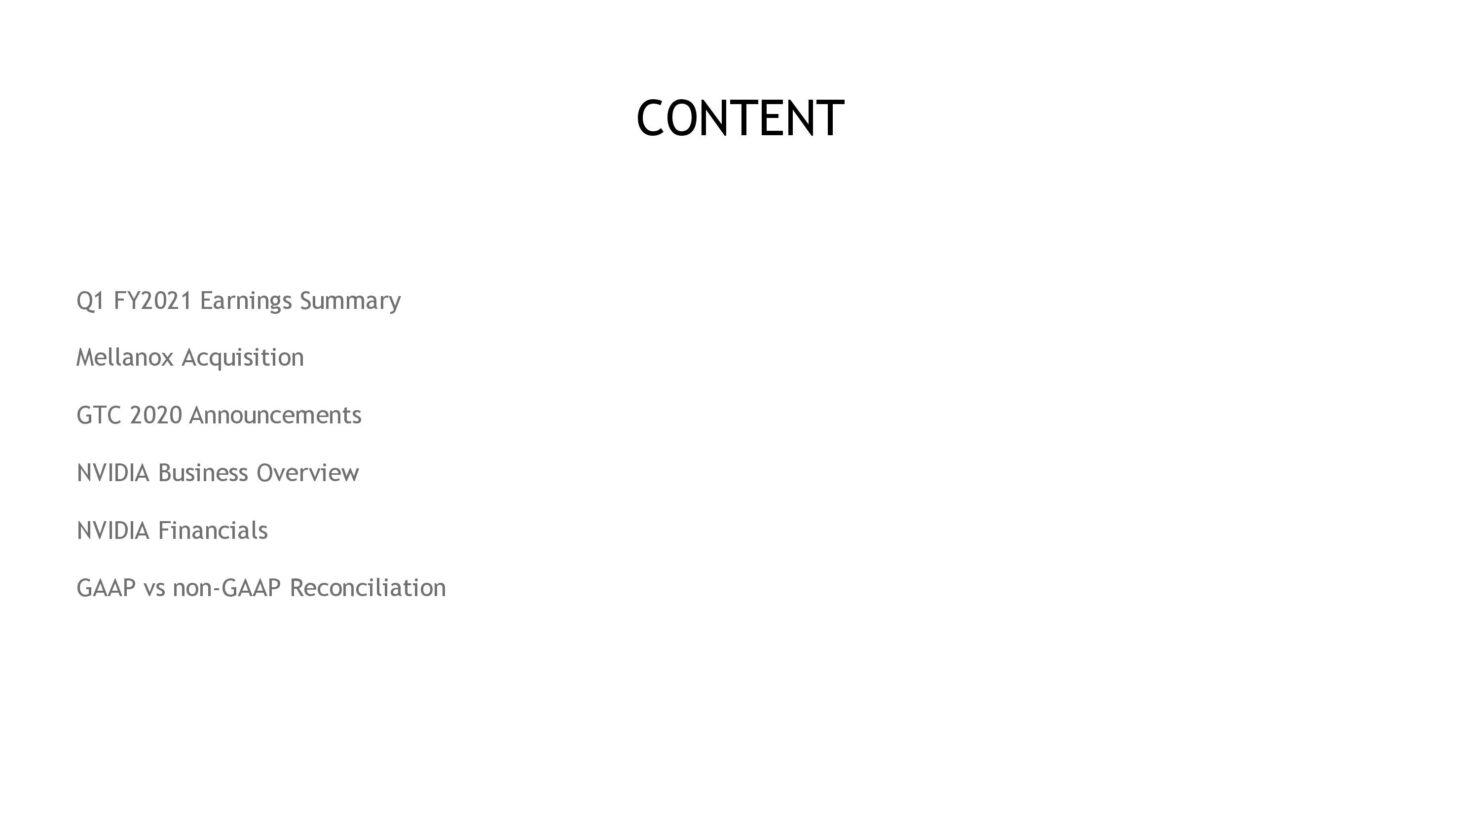 nvda-1qfy21-investor-presentation-5-21-20-final-page-003